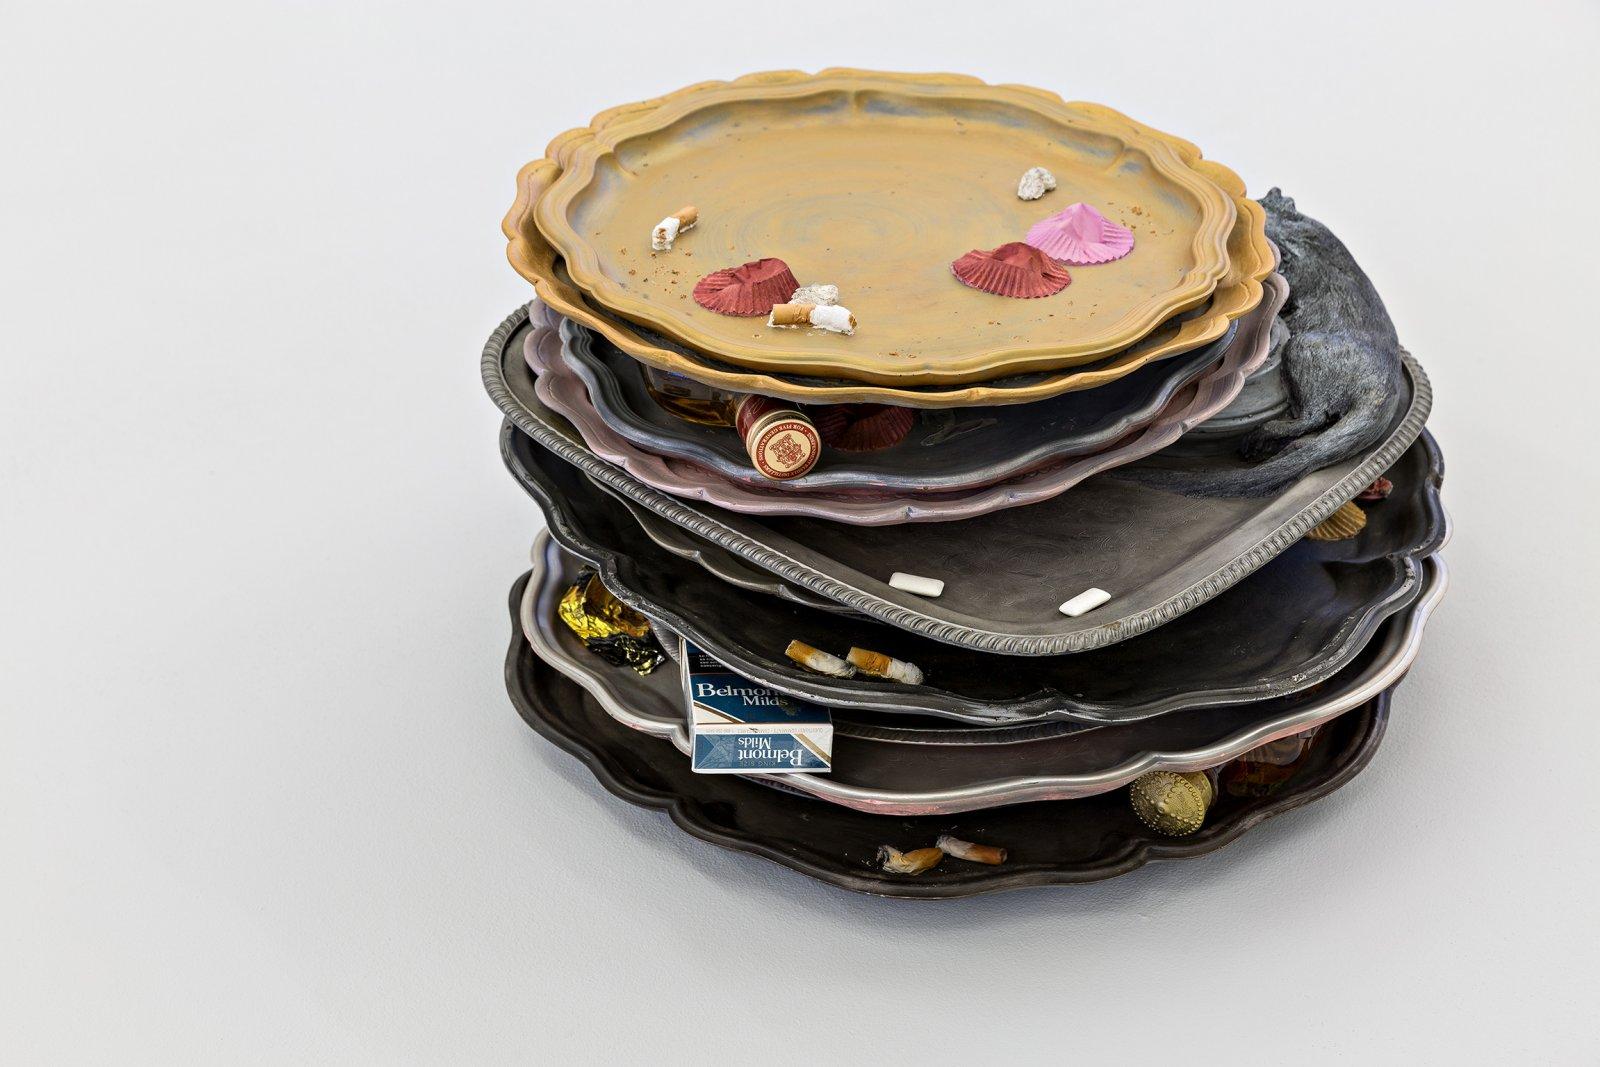 Liz Magor, Stack of Trays, 2008, polymerized gypsum, chewing gum, found objects, 10 x 18 x 19 in. (25 x 45 x 47 cm) by Liz Magor